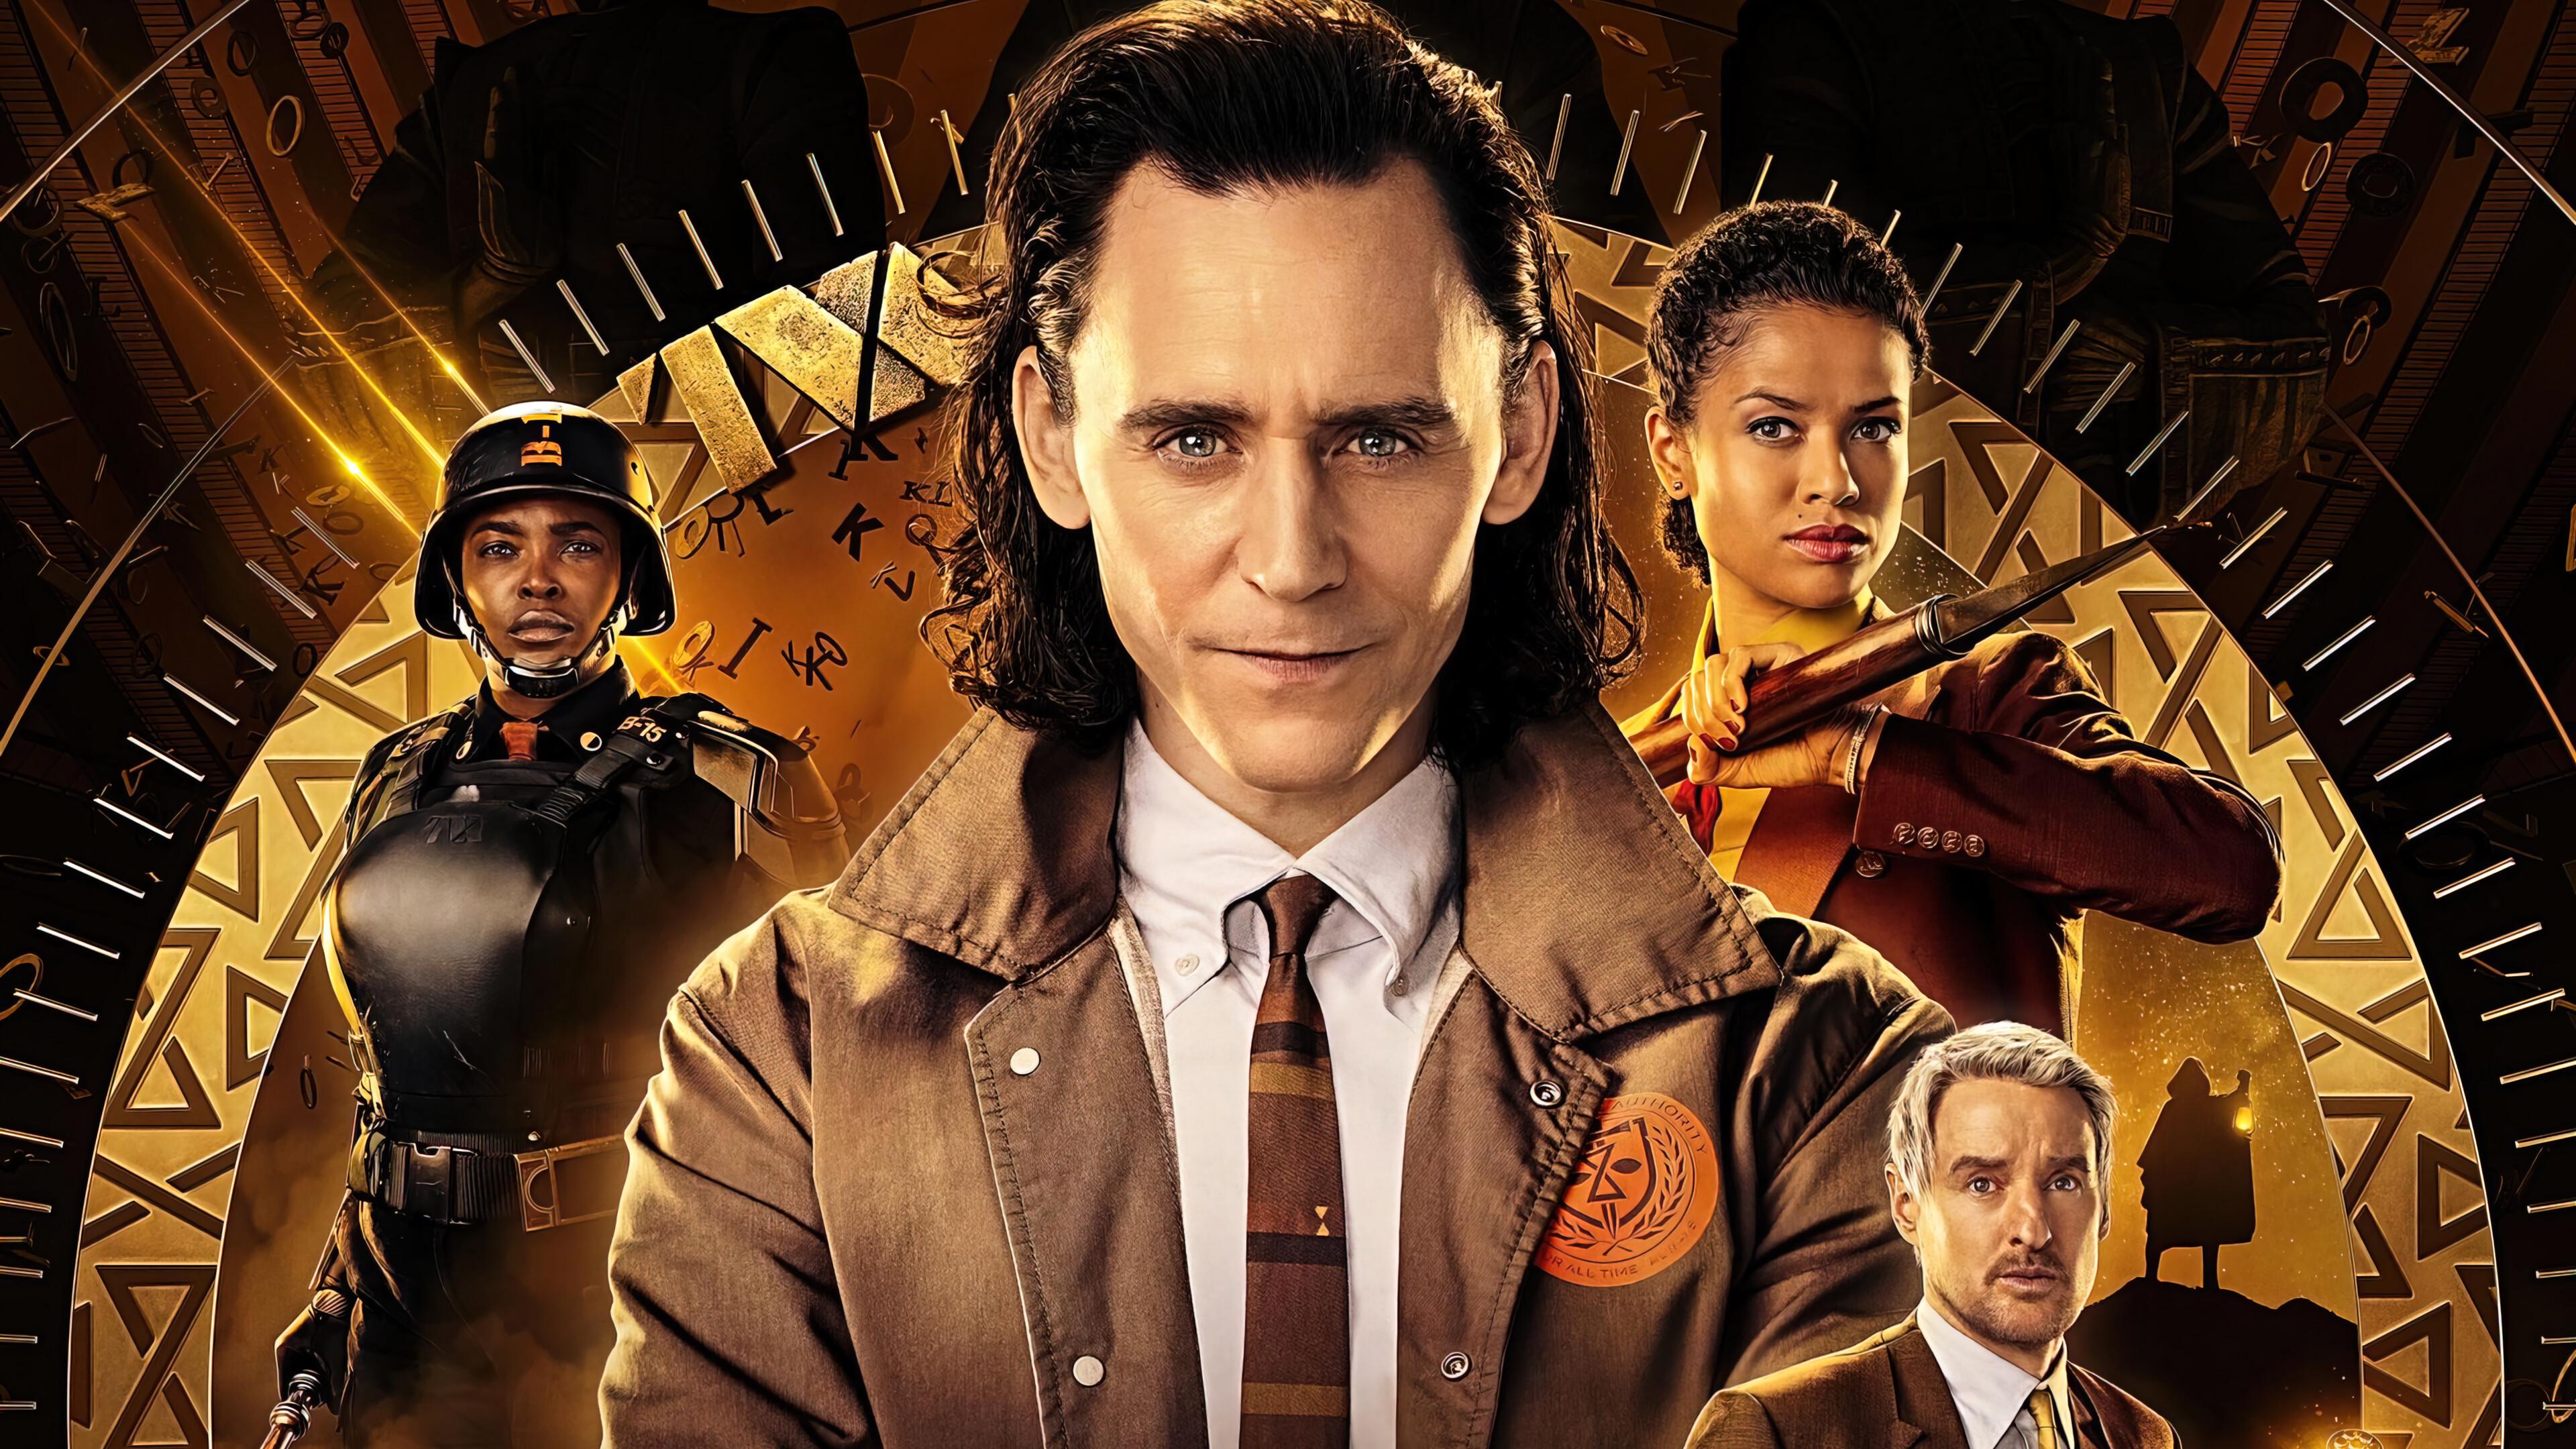 Loki TV Series Character Poster 4K Phone iPhone Wallpaper 7970a 3840x2160